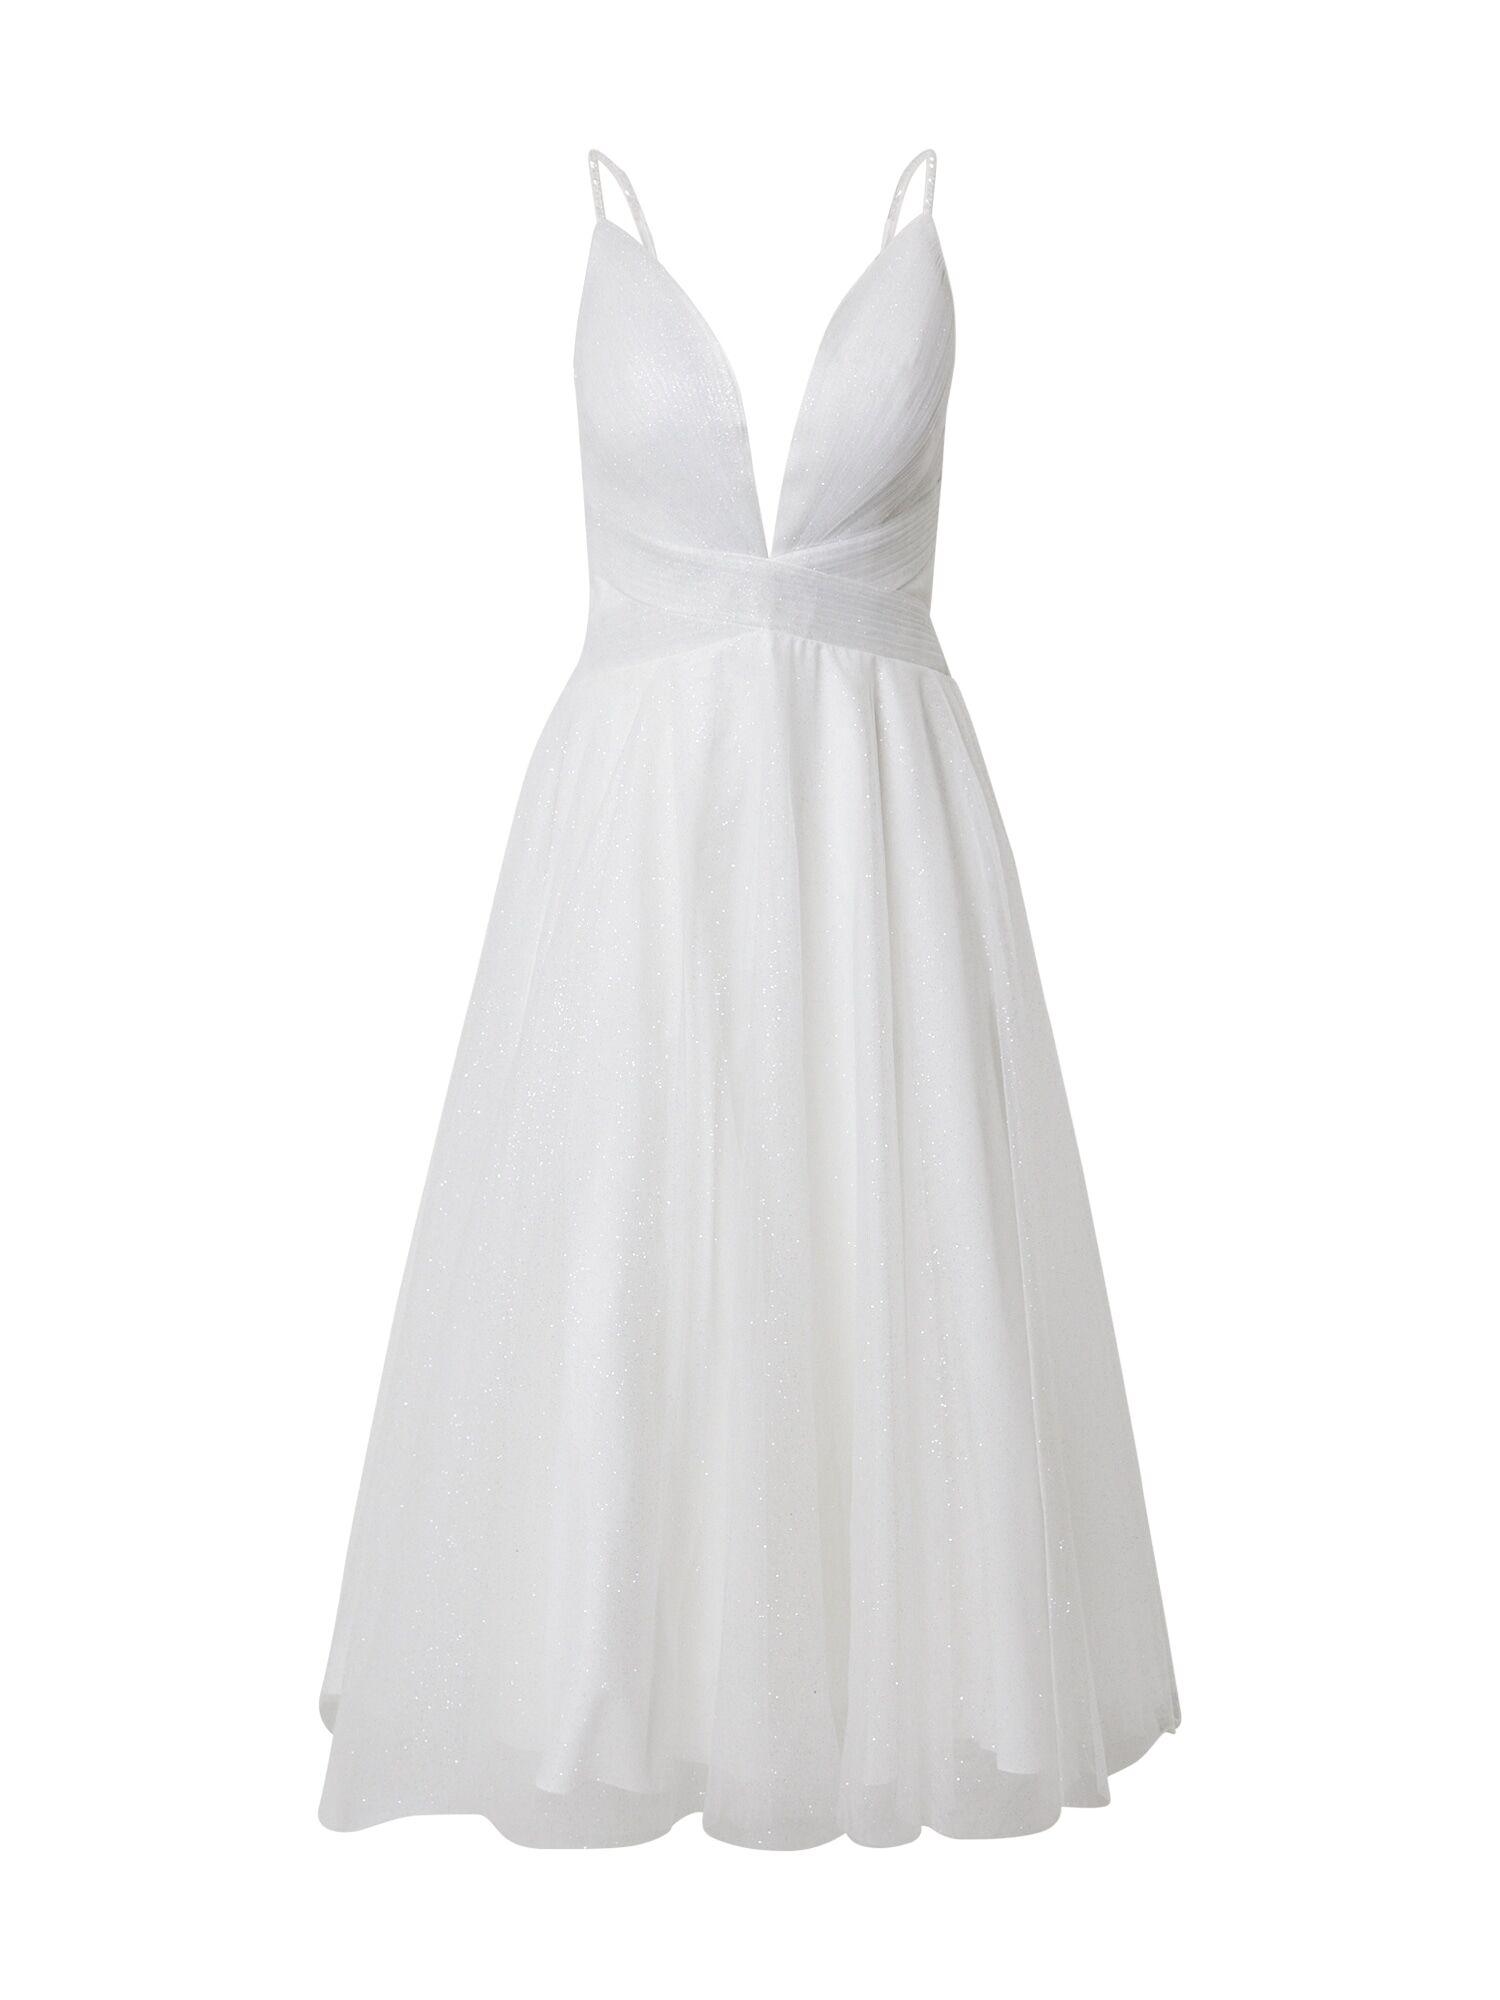 mascara Robe de soirée  - Blanc - Taille: 34 - female